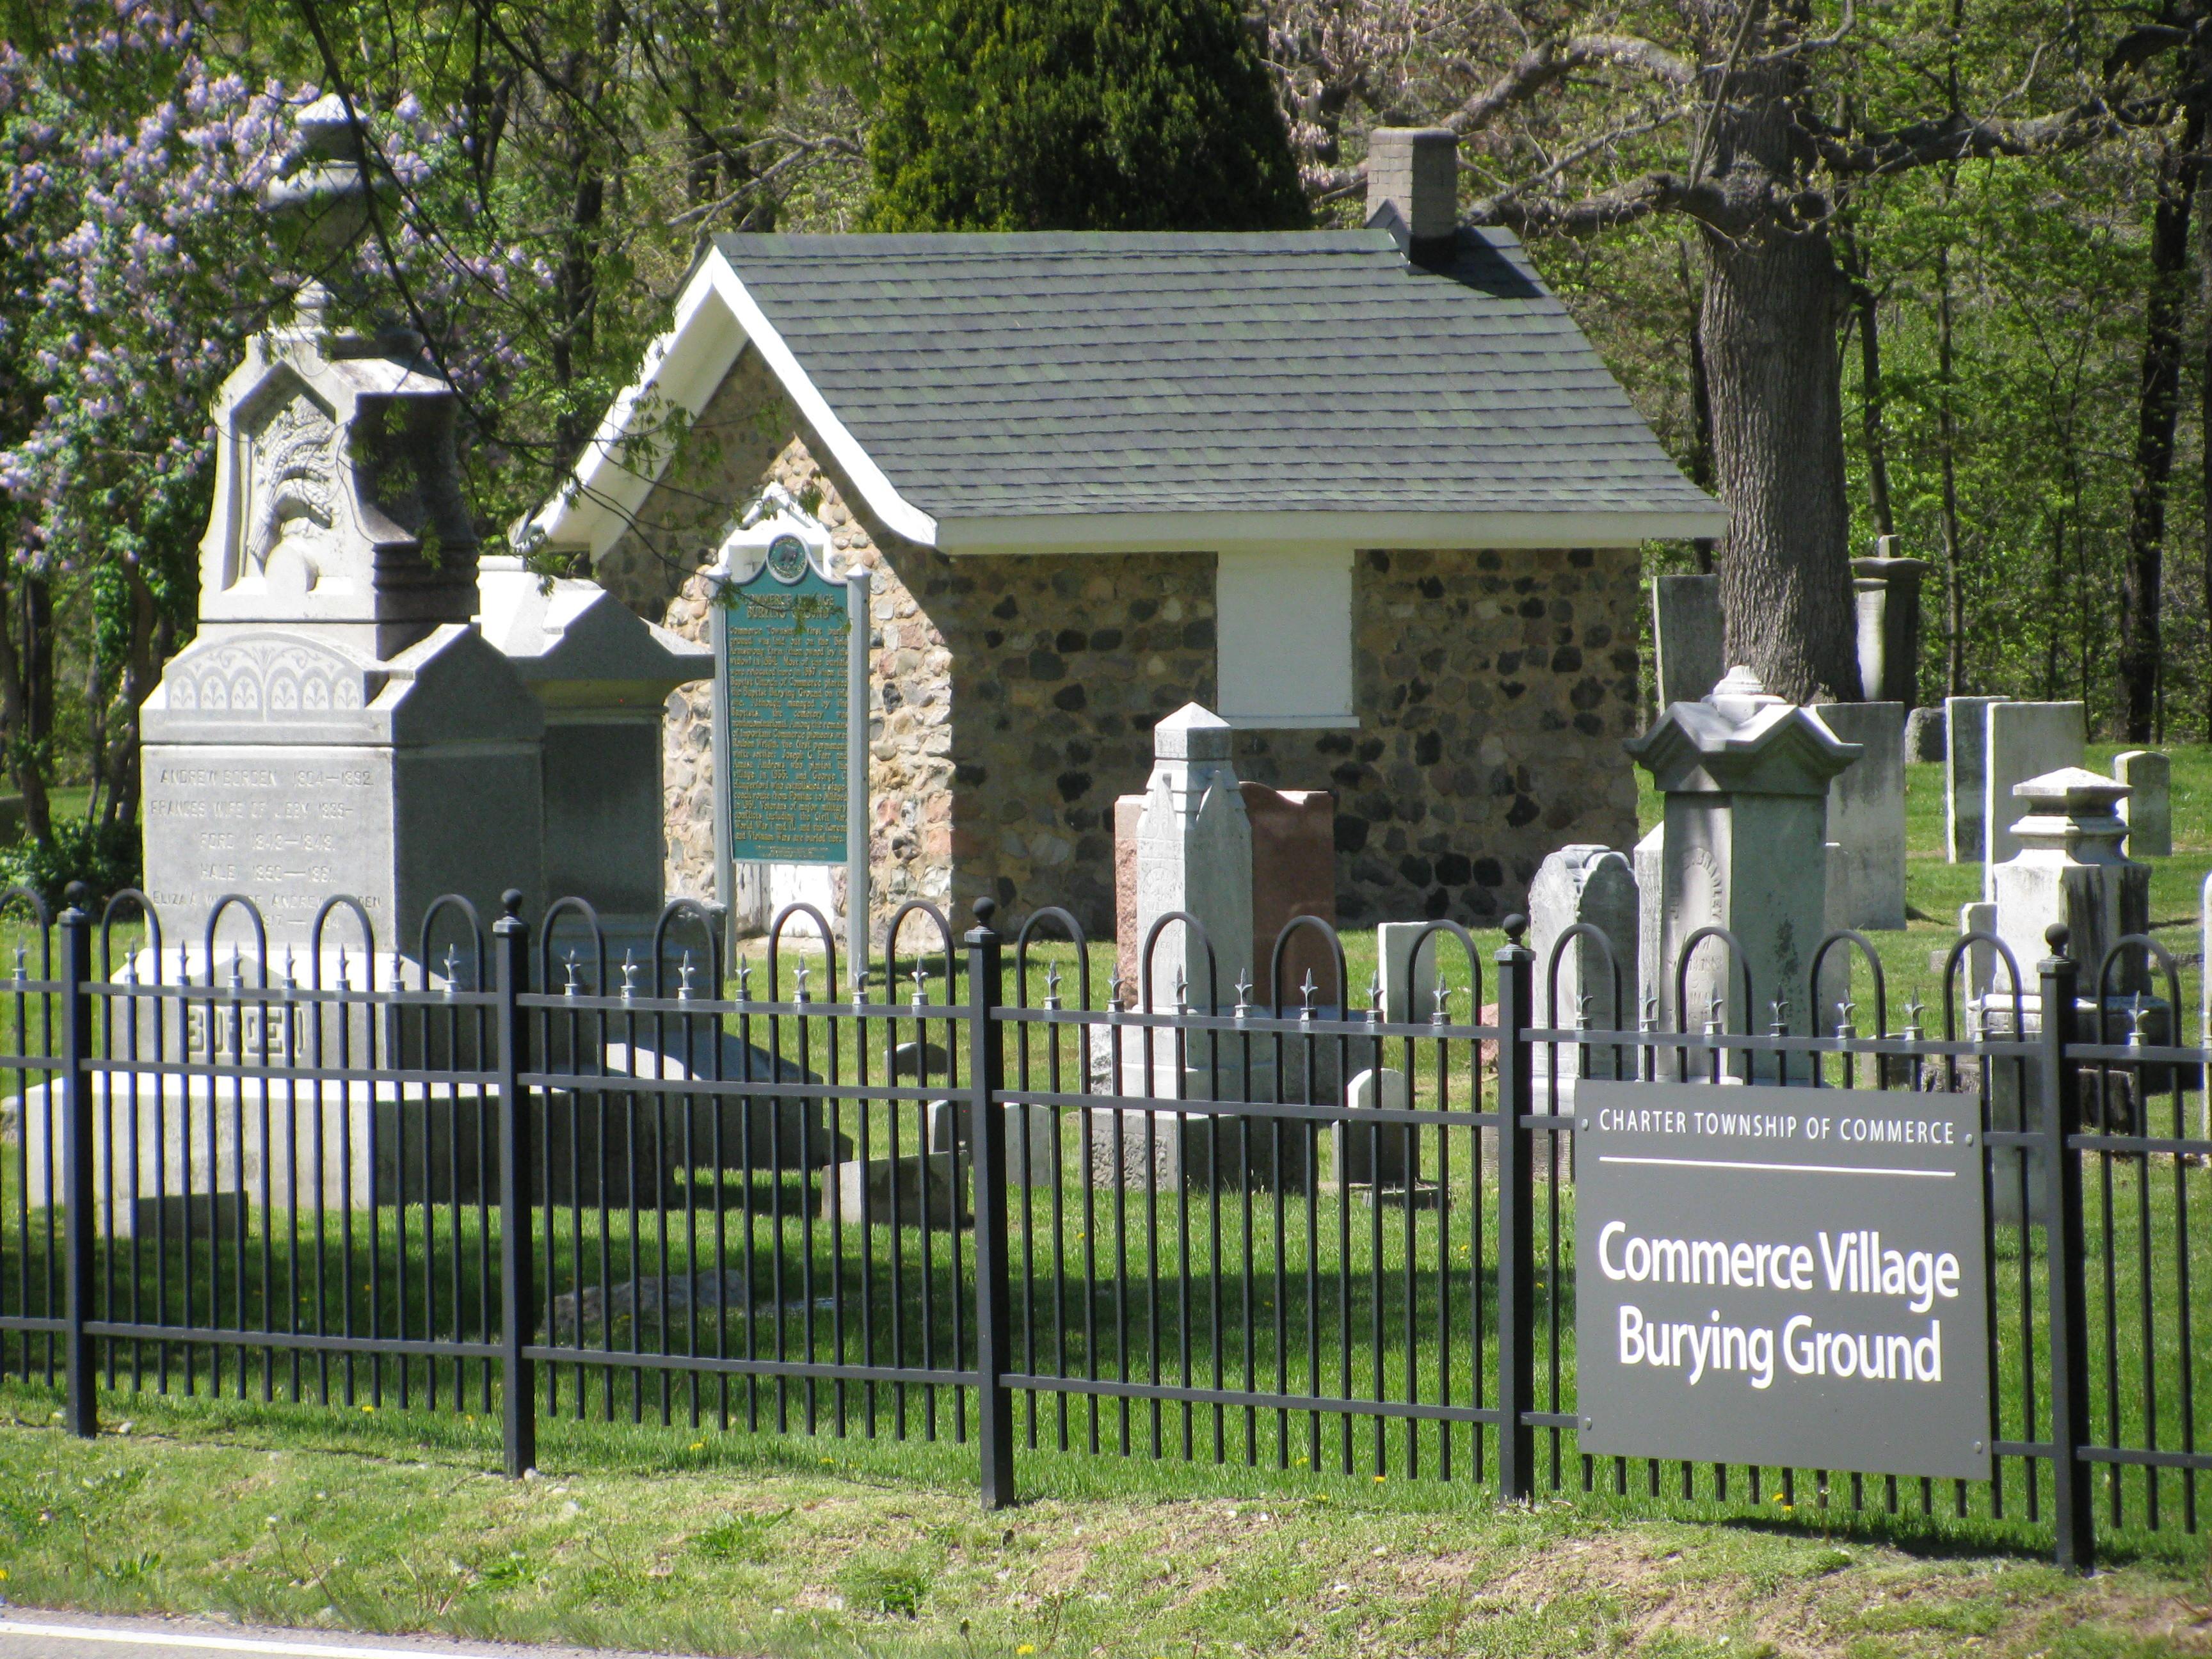 Commerce Village Burying Ground